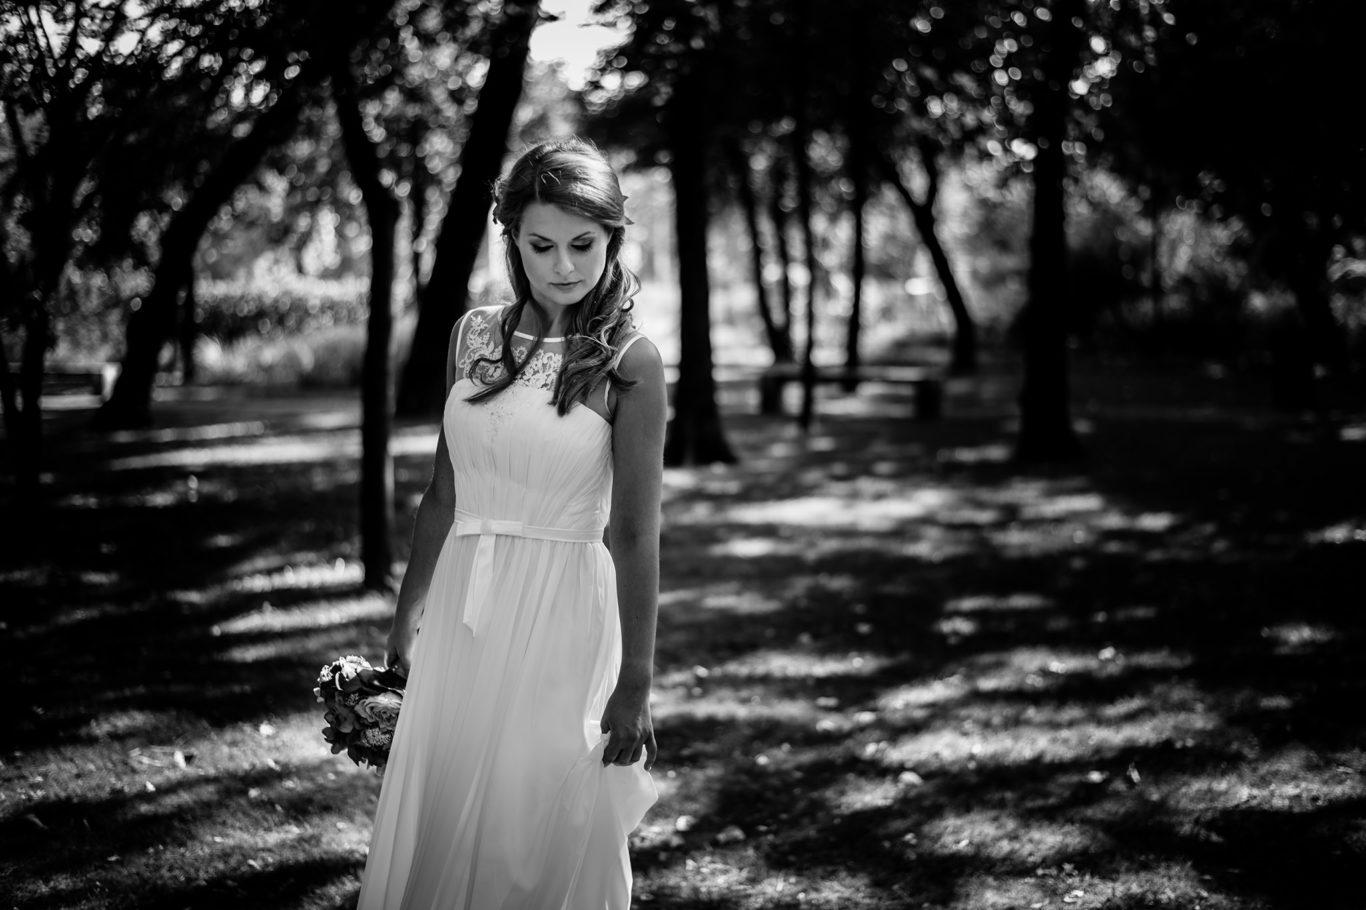 0255-fotografie-nunta-bucuresti-rodica-rares-fotograf-ciprian-dumitrescu-dsc_2481